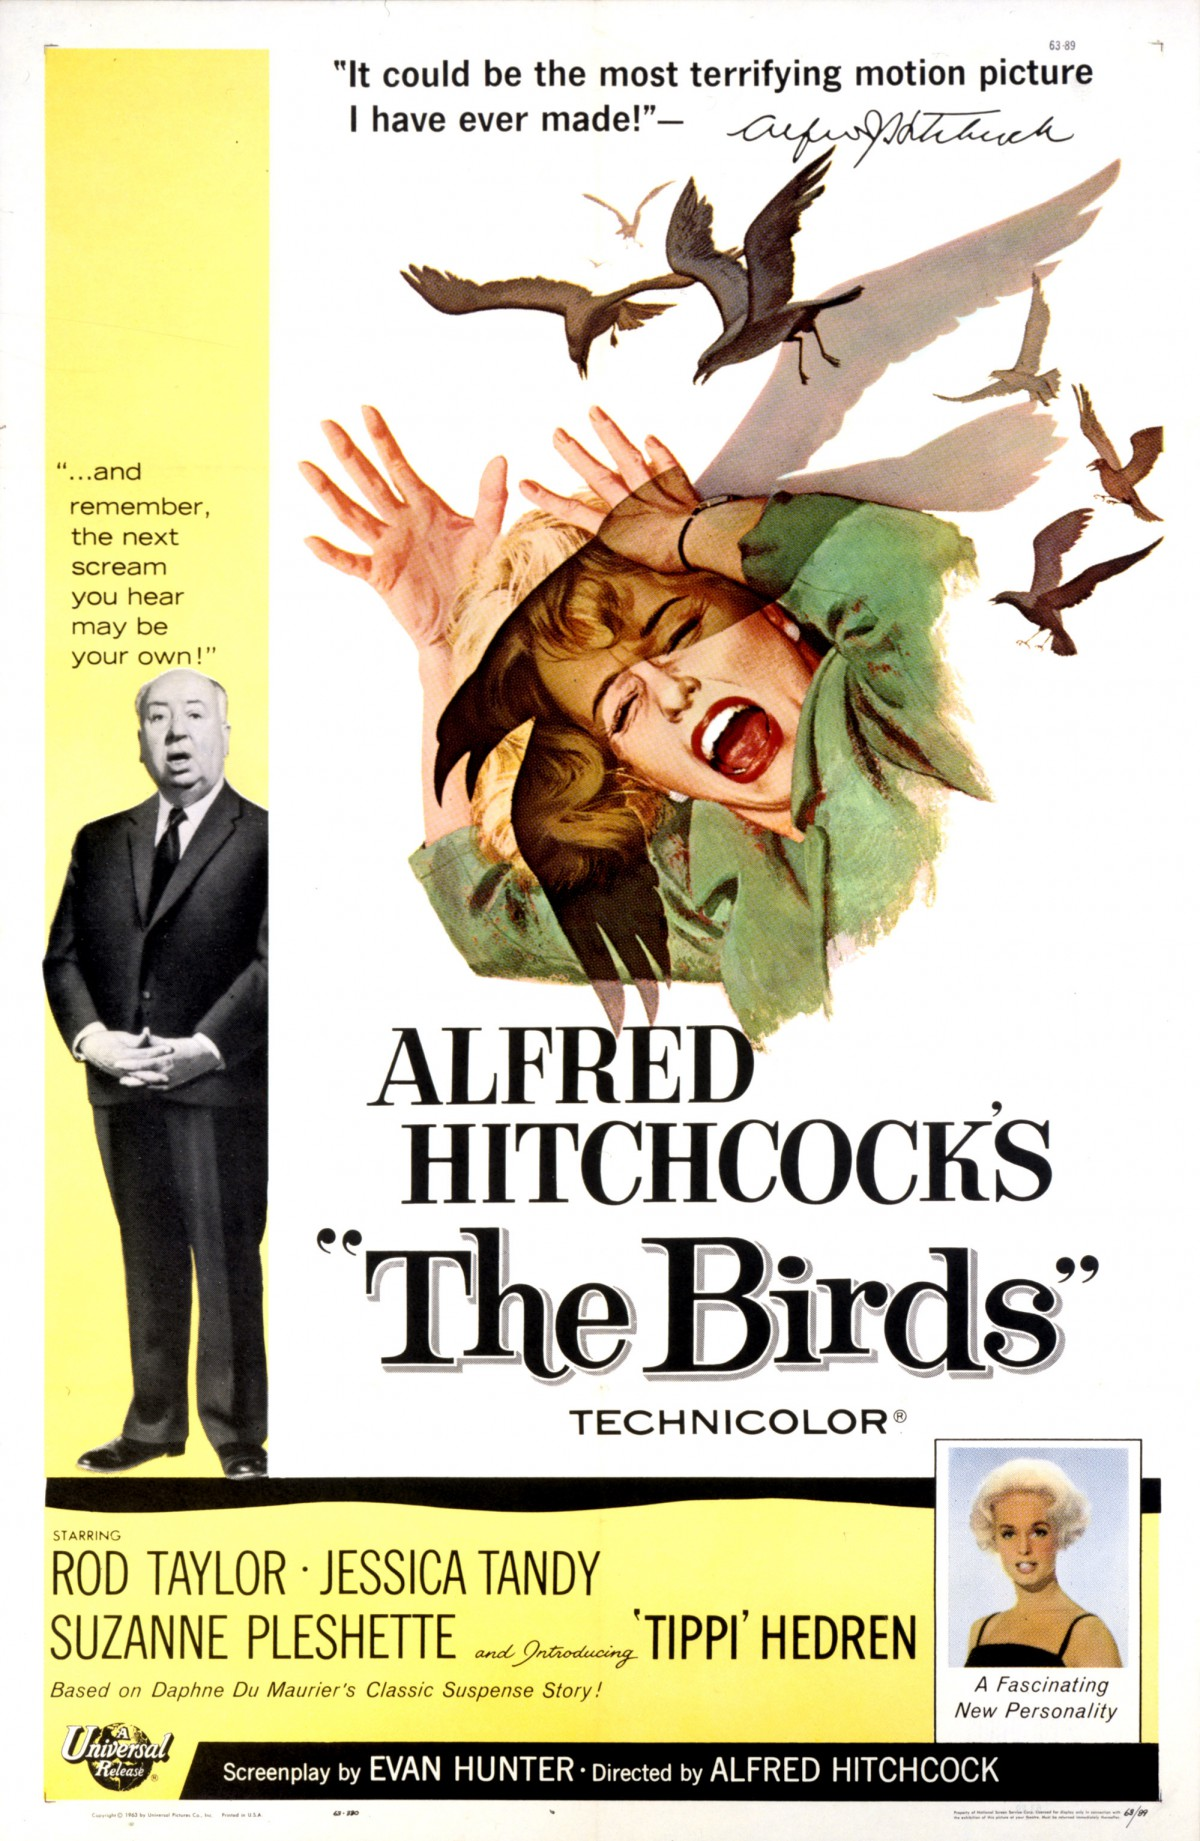 78. The Birds (1963)